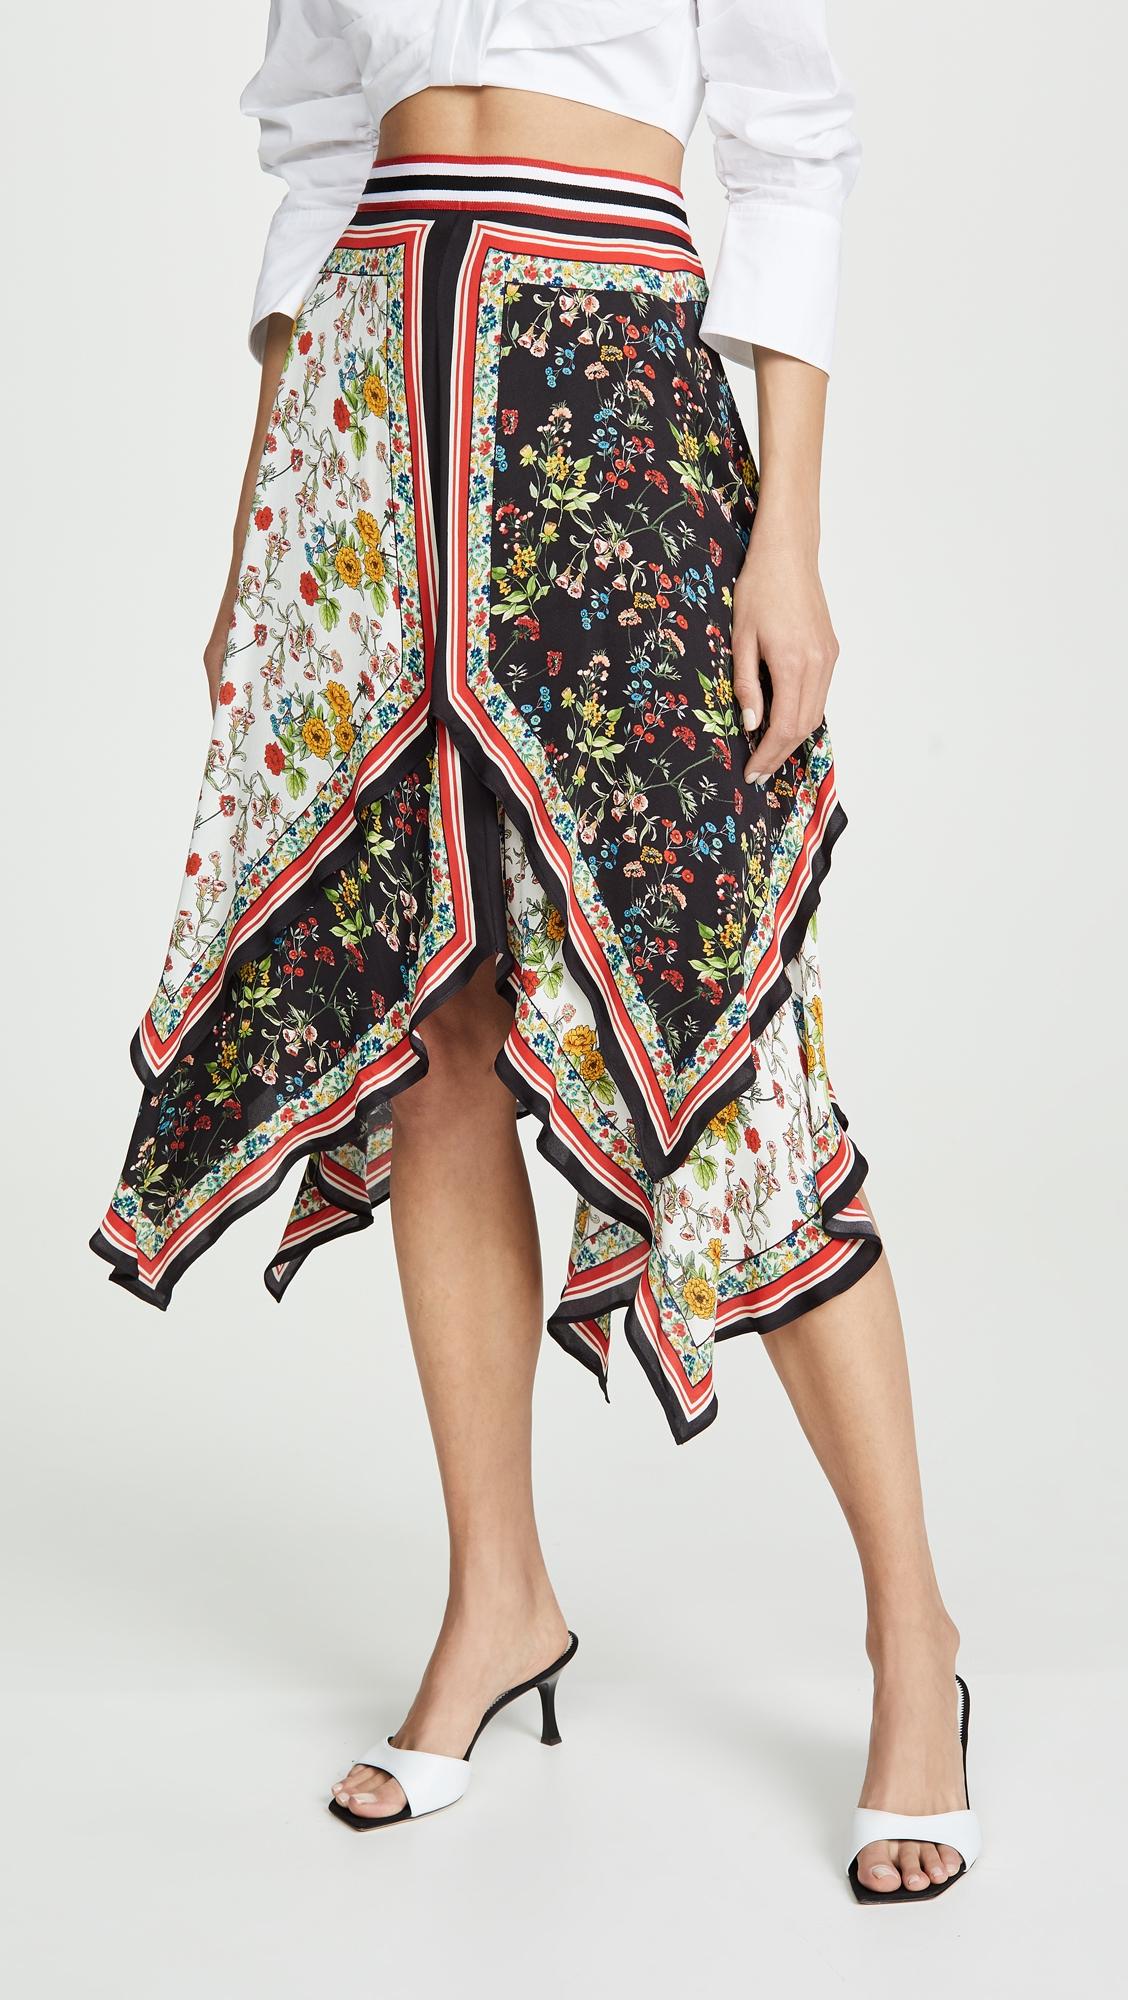 660bdb5702c alice + olivia Maura Tiered Handkerchief Skirt in 2019 | Products ...